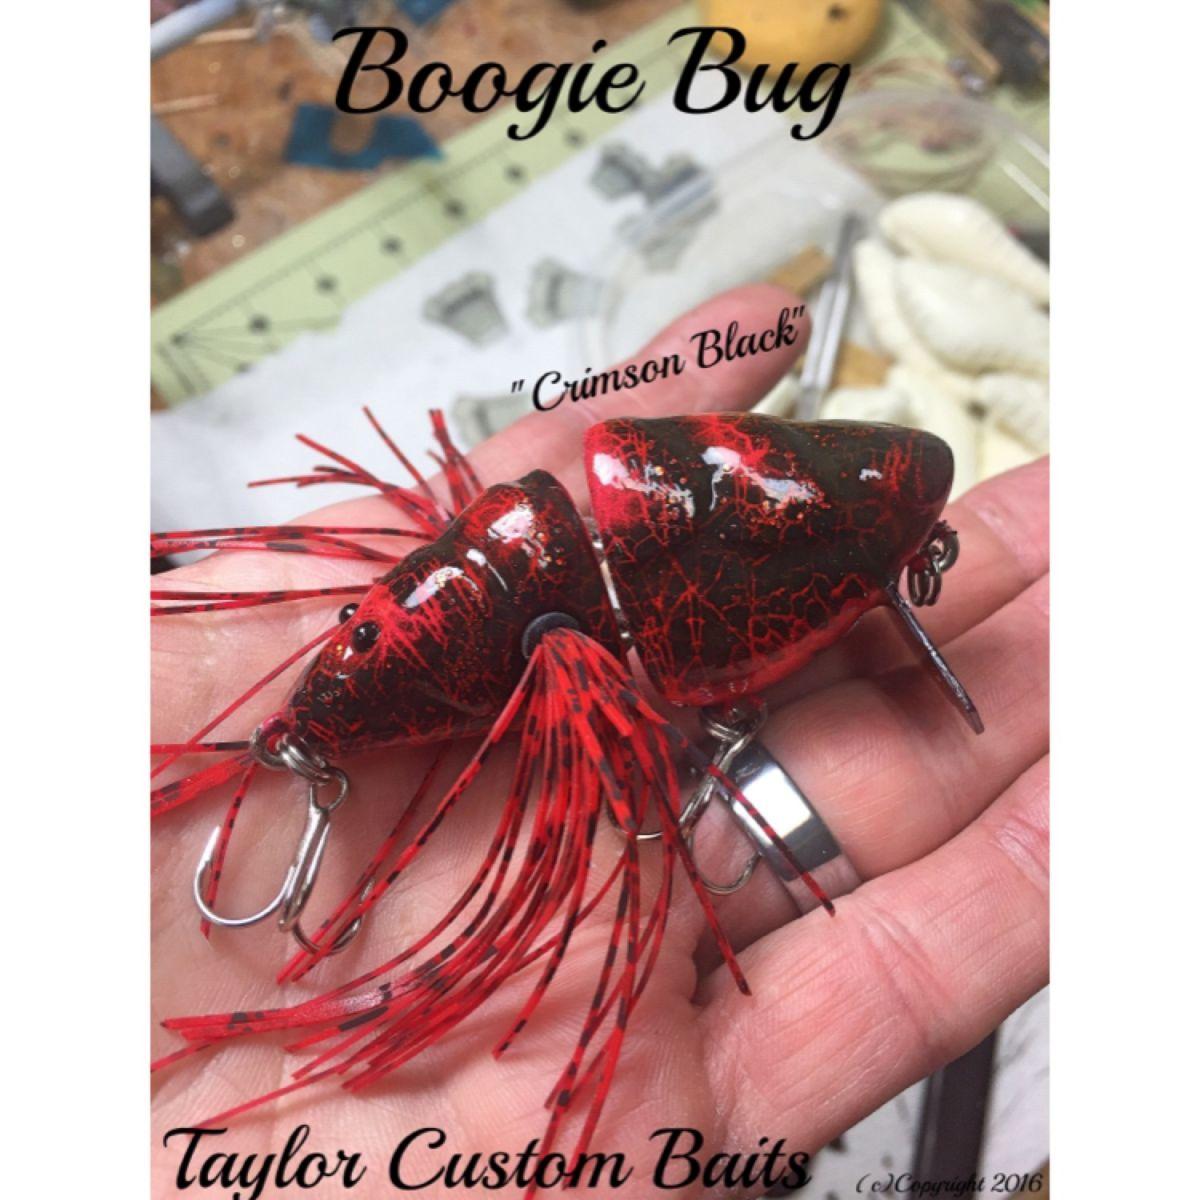 Boogie Bug